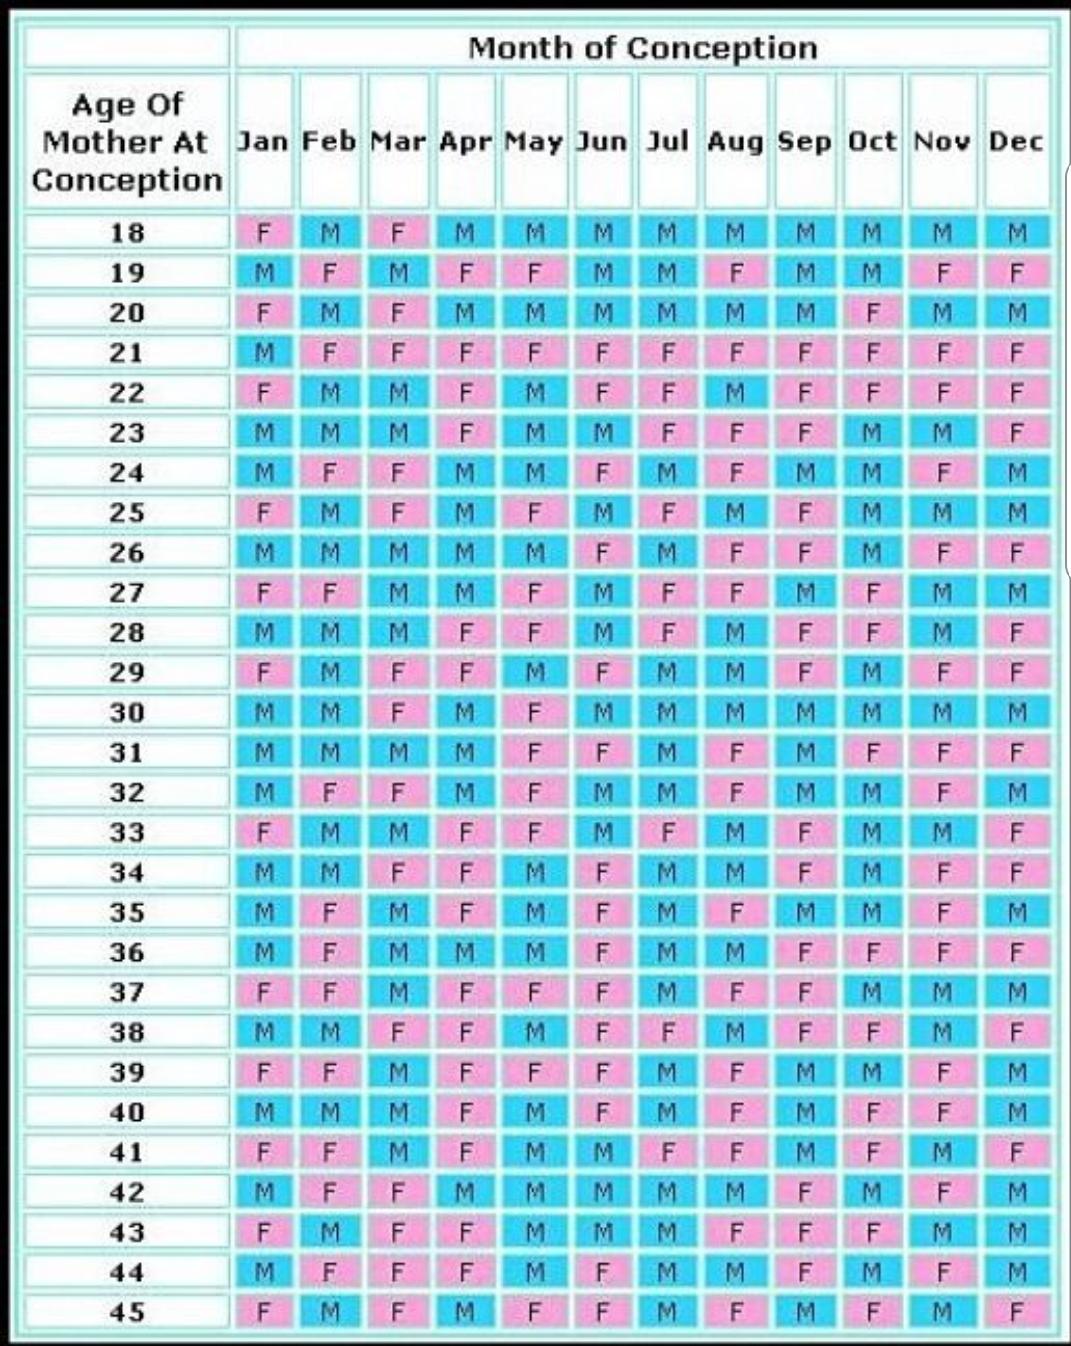 2018 Chinese Gender Calendar : chinese, gender, calendar, Chinese, GENDER, Chart, December, Babies, Forums, Expect